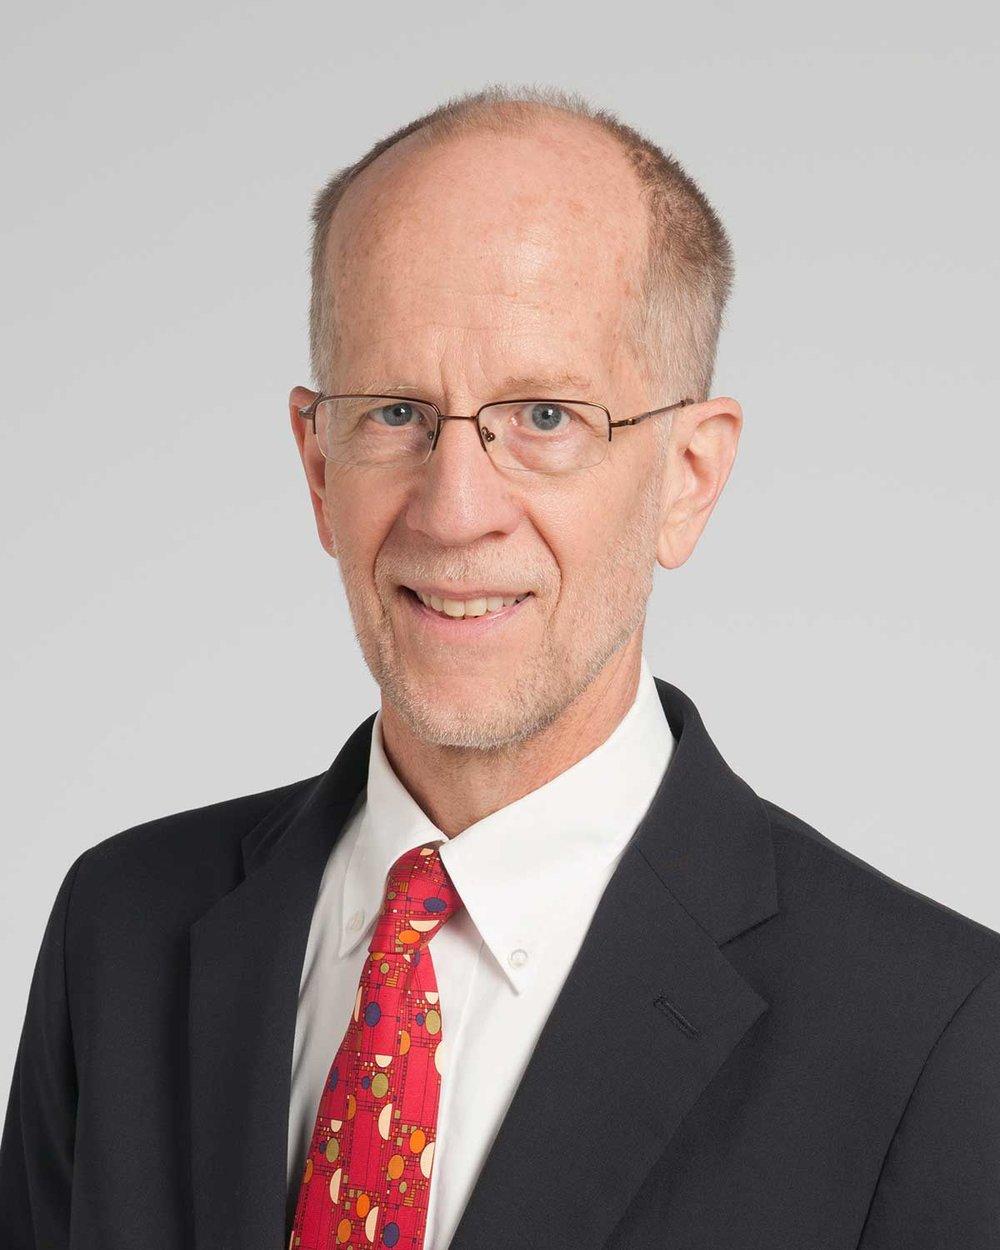 David Van Wagoner, PhD